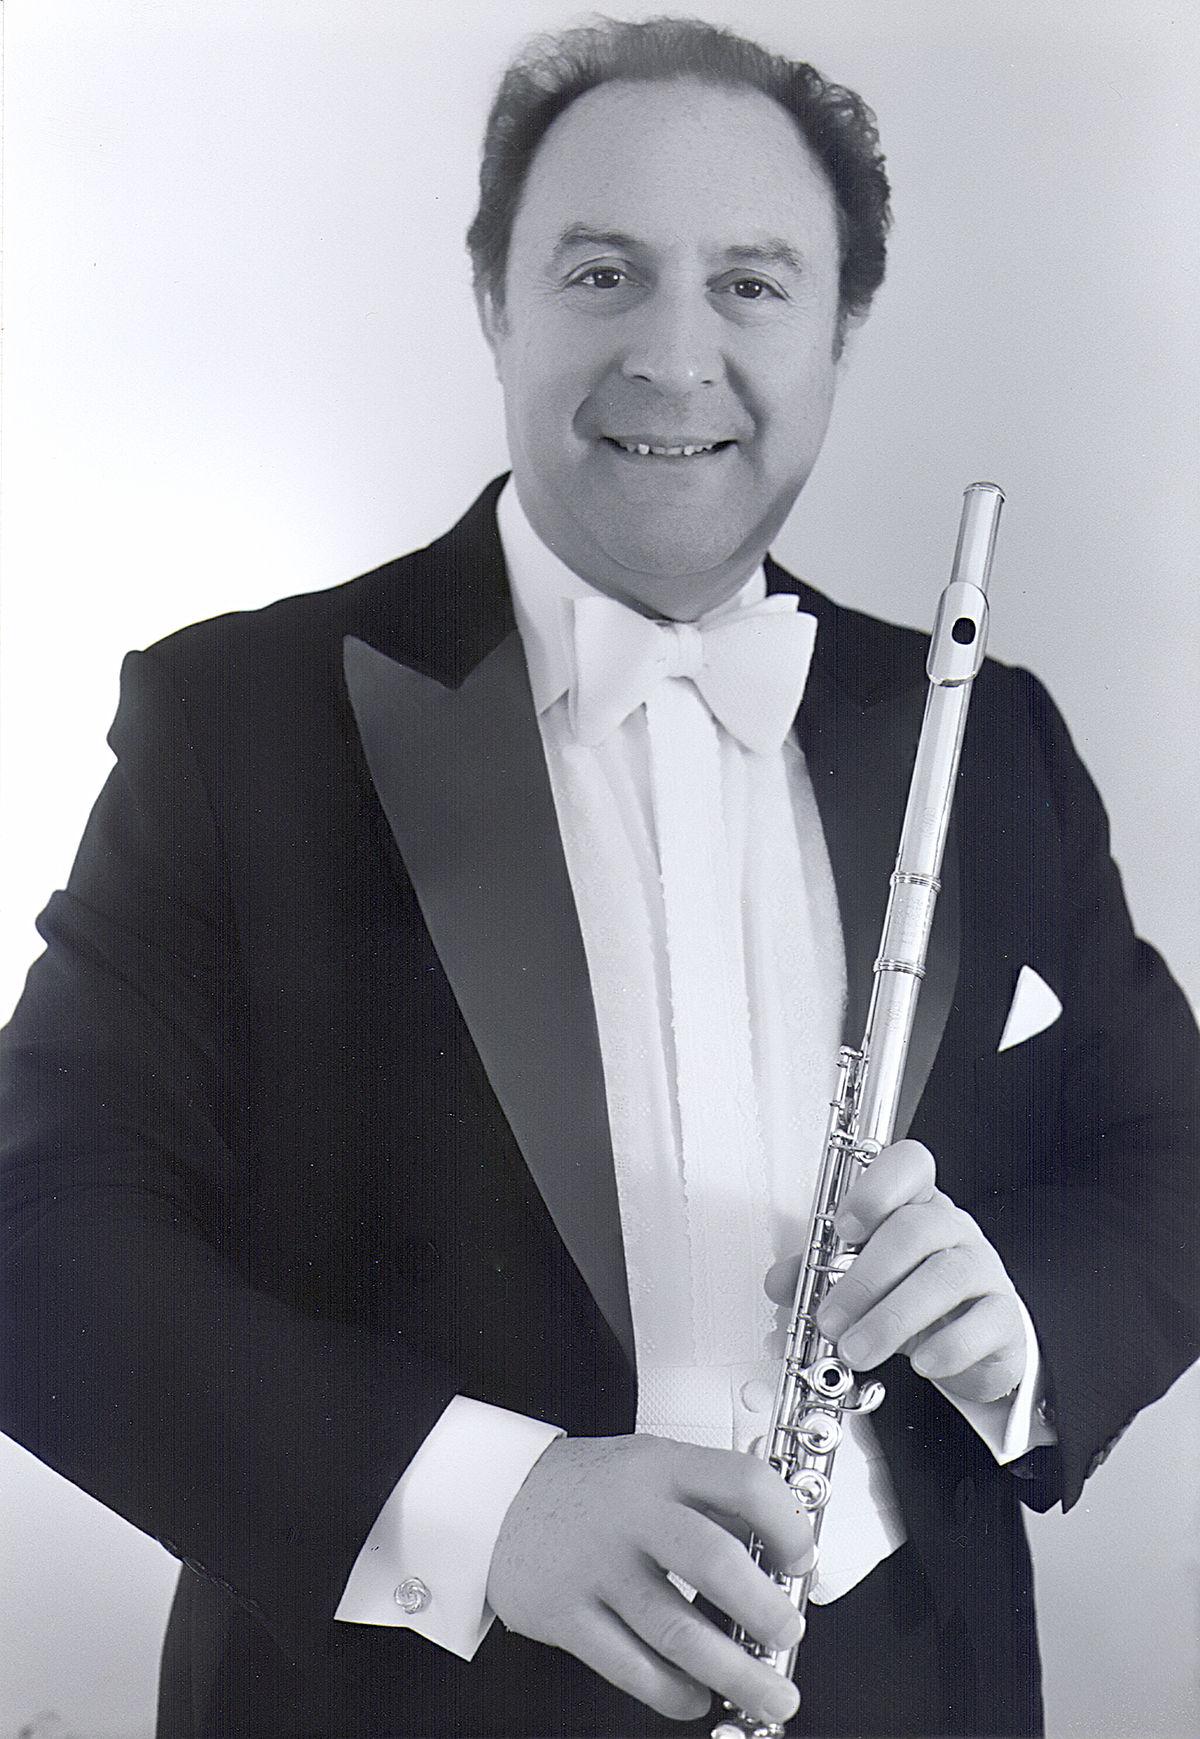 Paul P. - Jean-Pierre Saucy